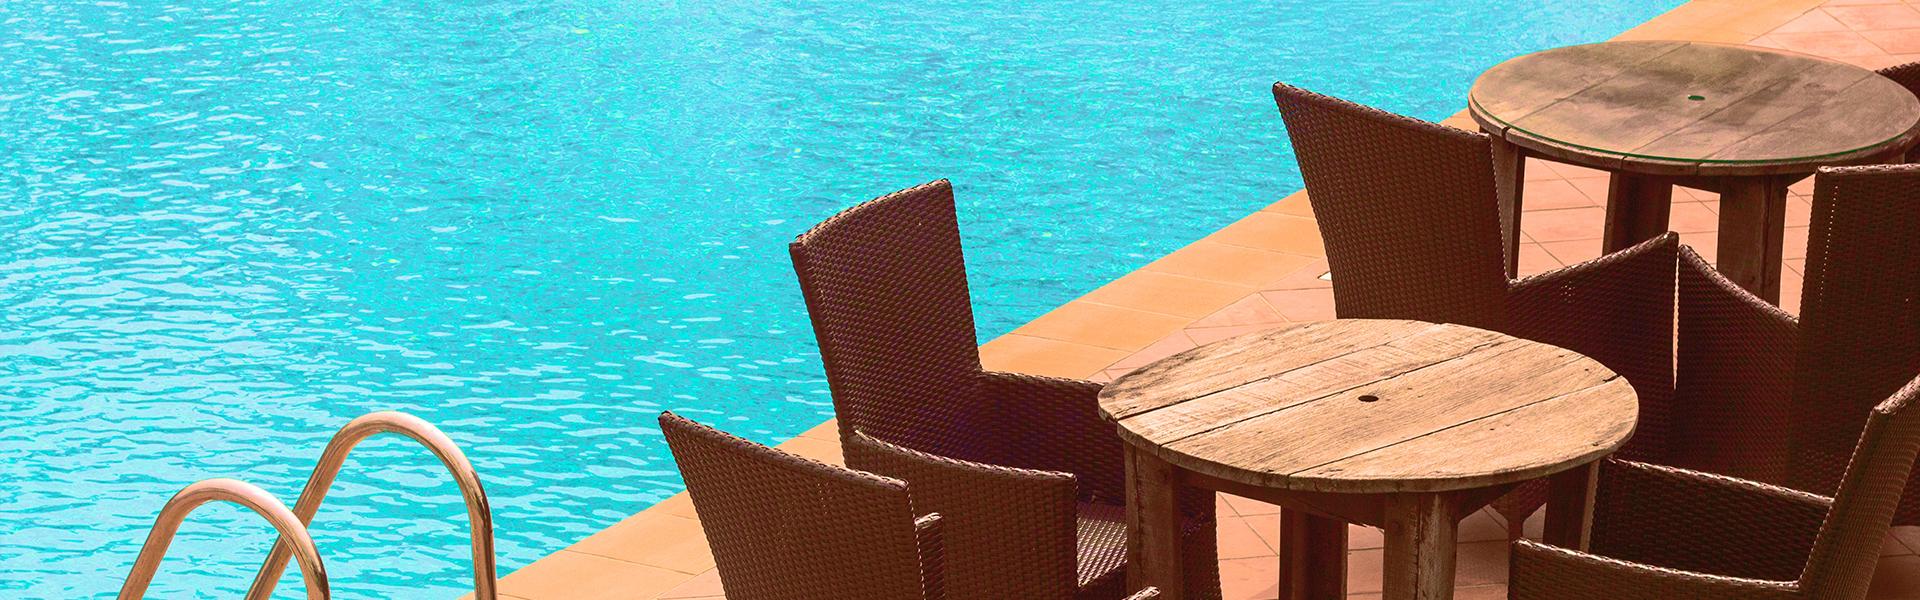 swimming-pool-header